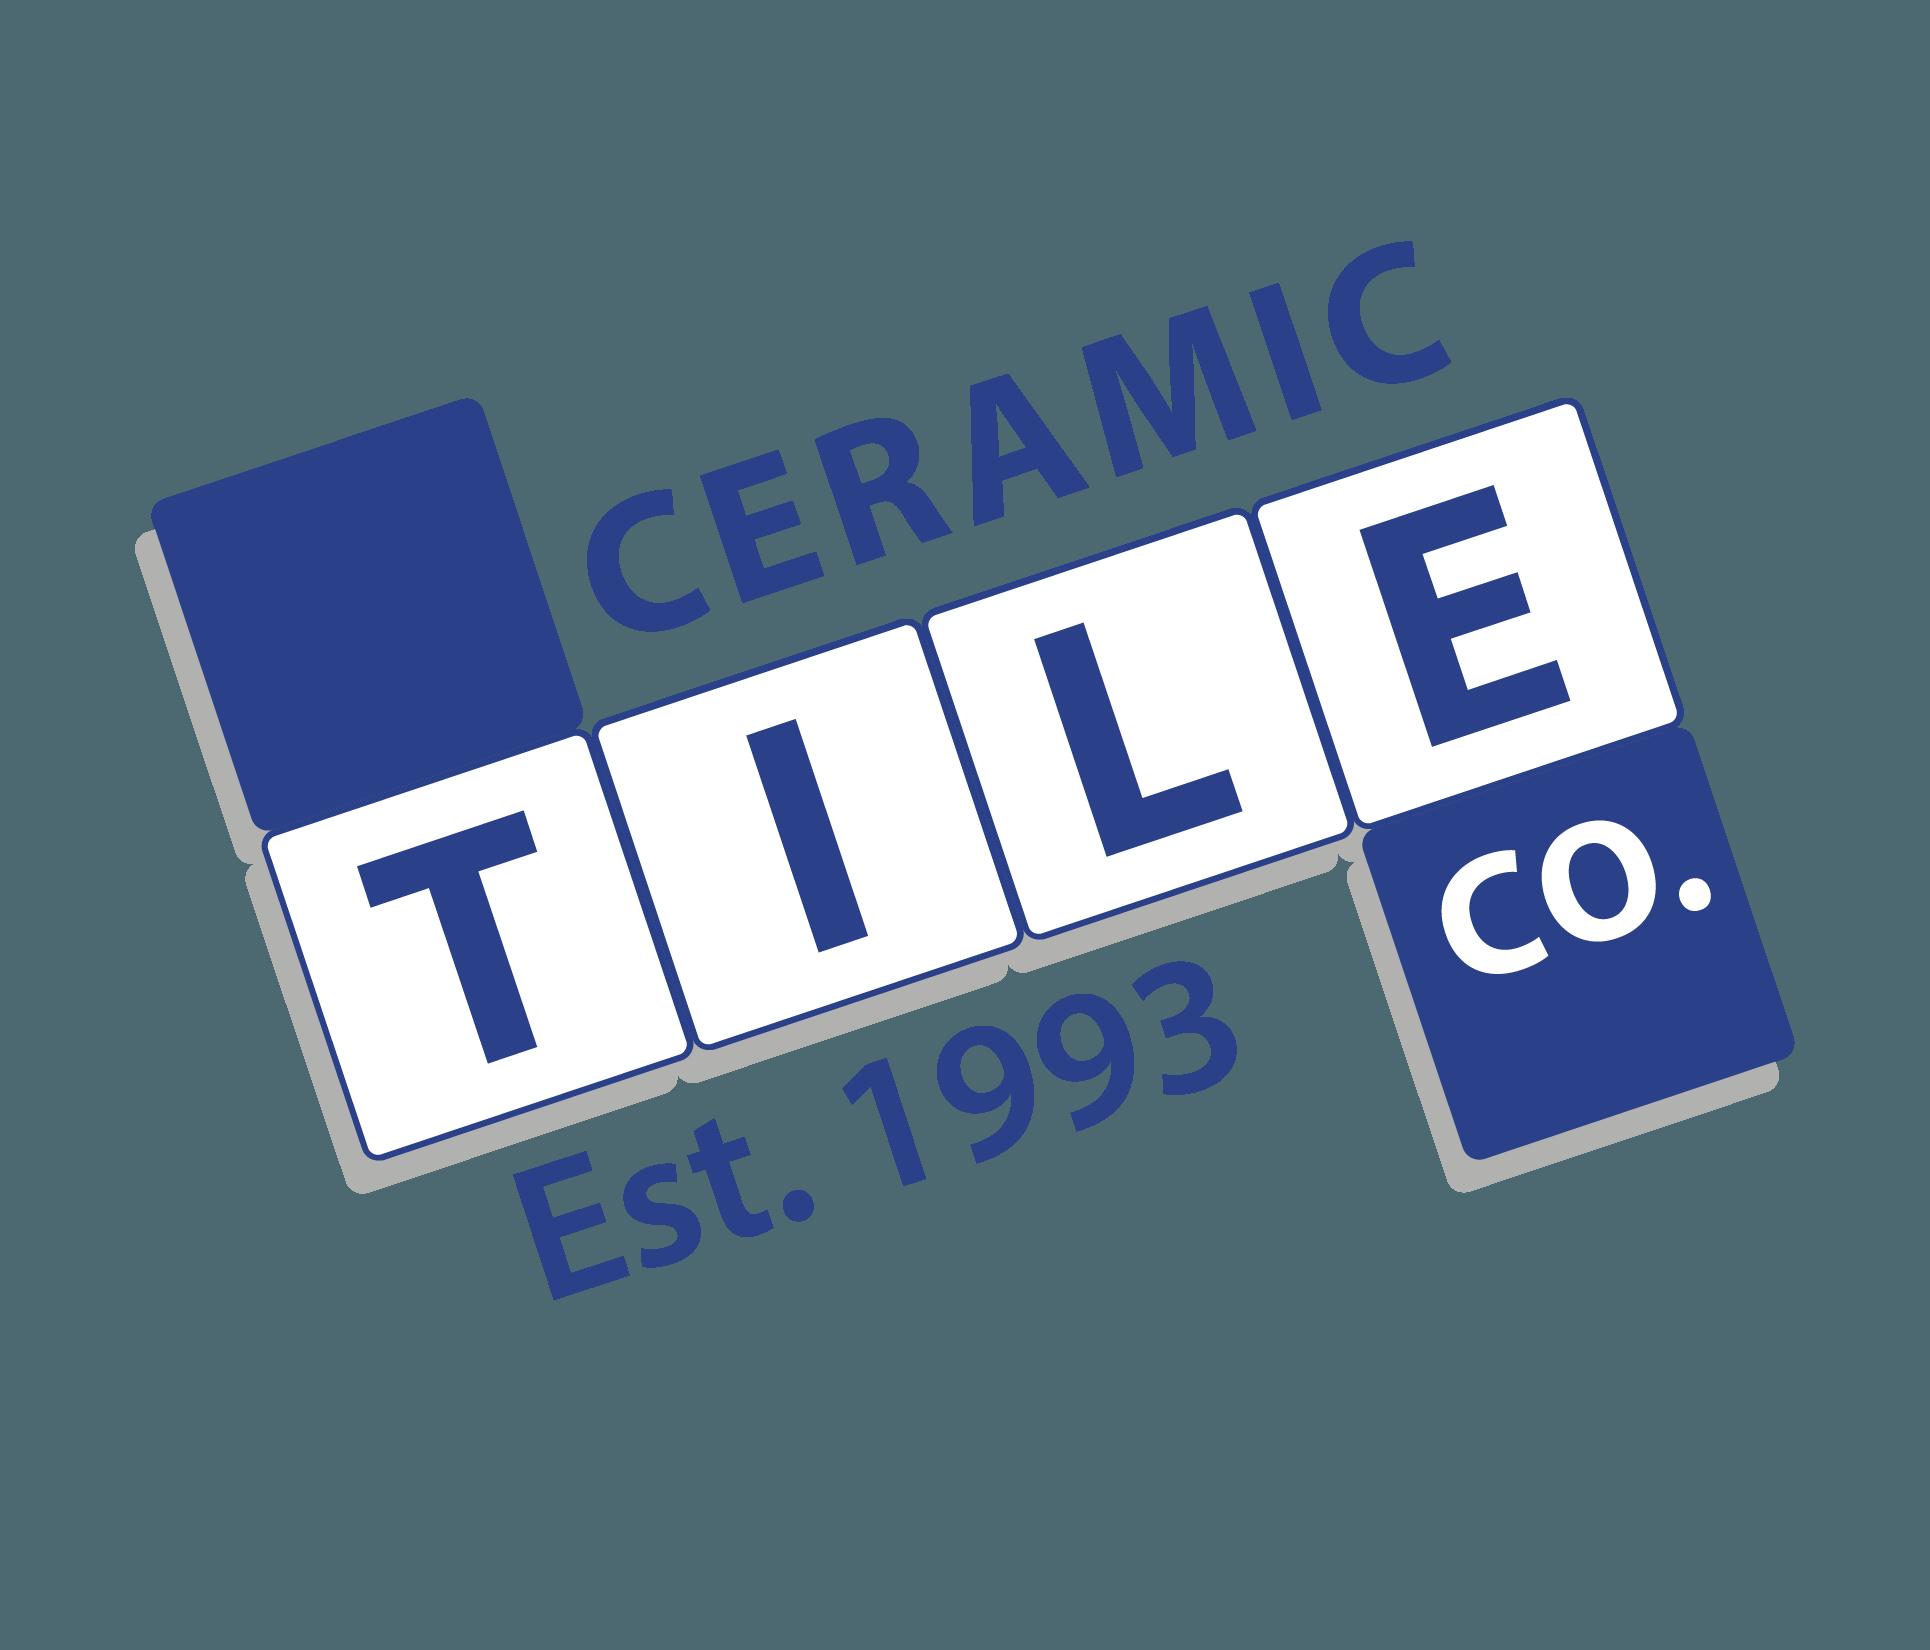 Tile merchants download free clipart with a transparent.